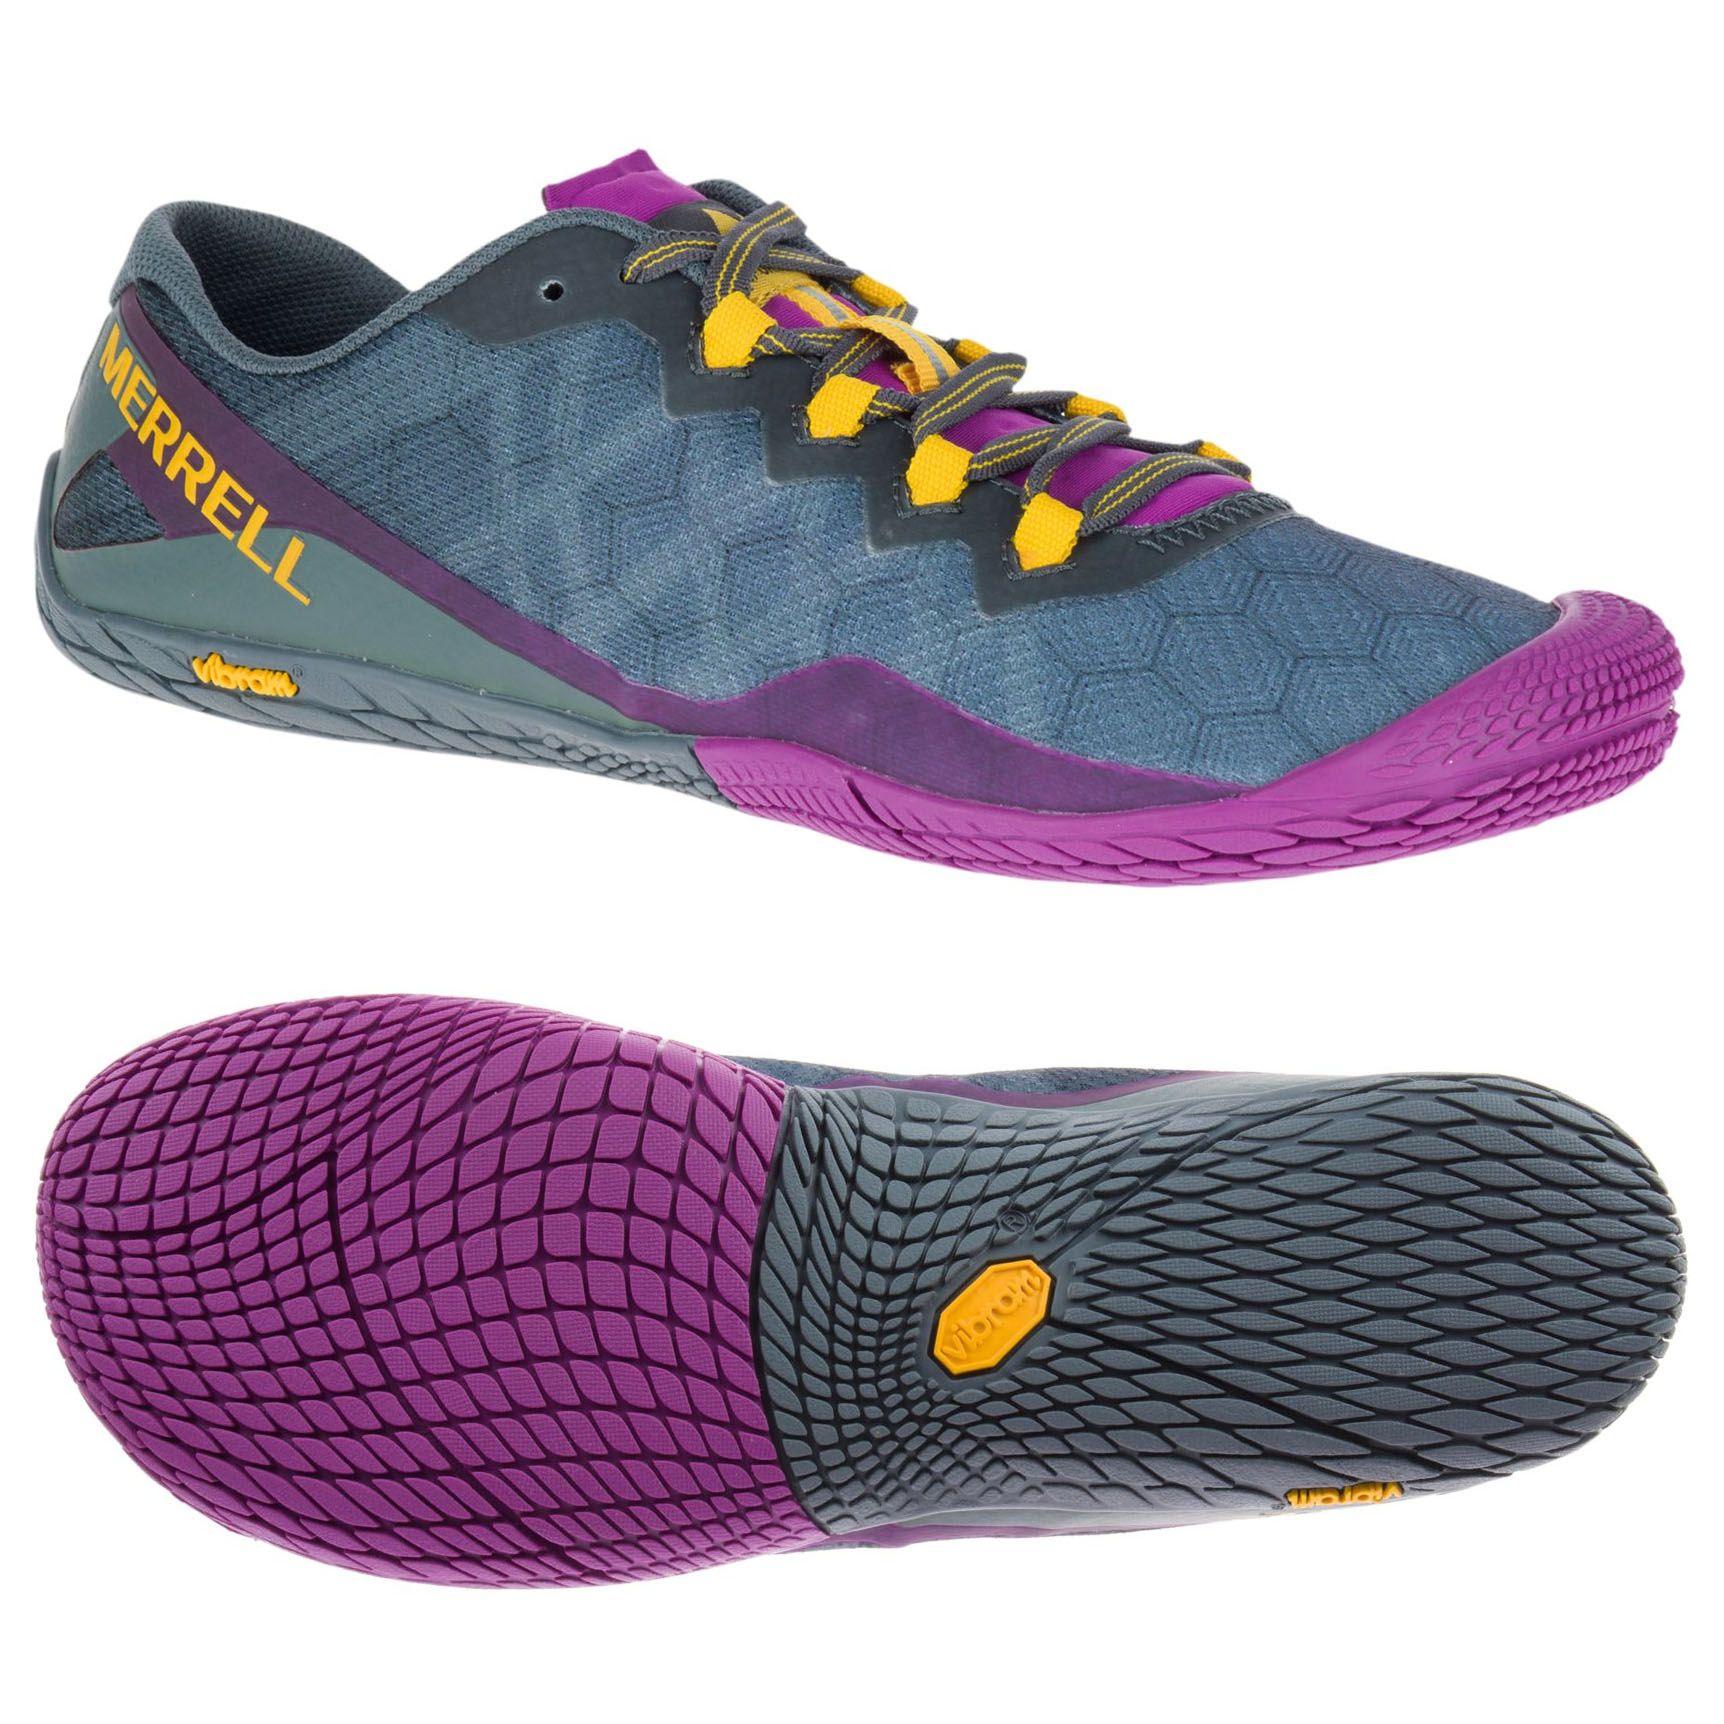 Merrell Vibram Running Shoes Review